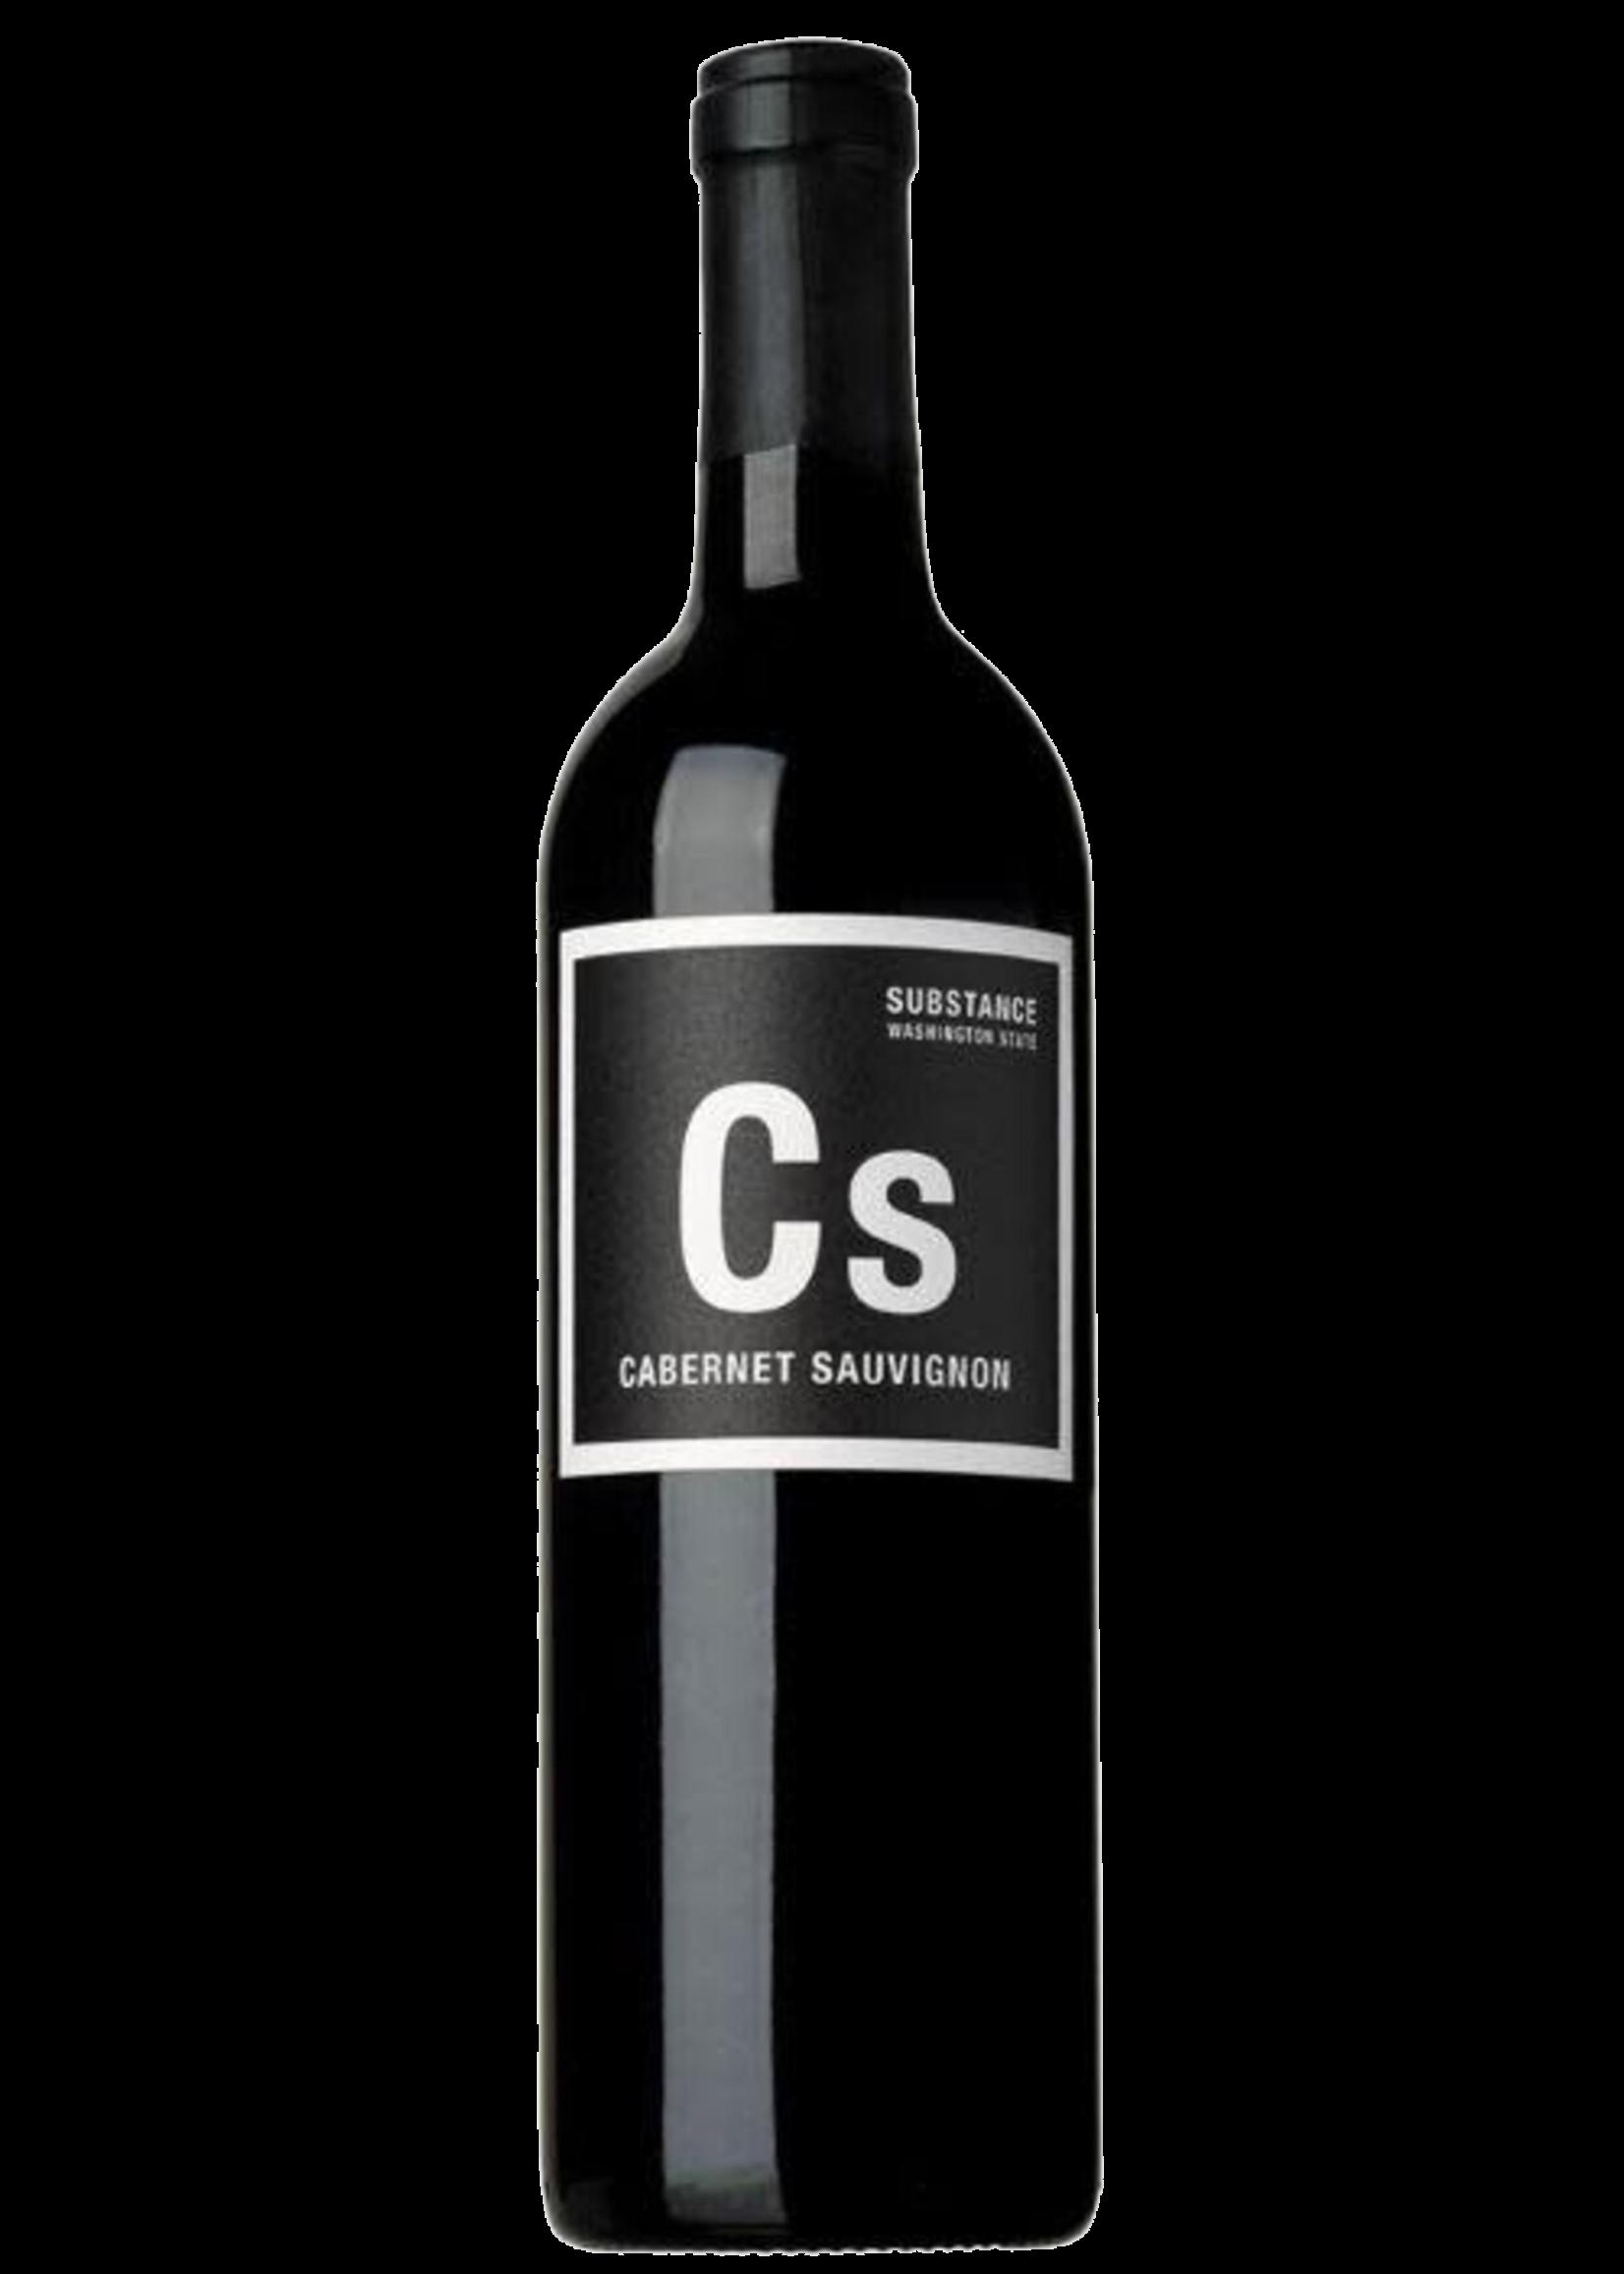 Wines of Substance — Substance Charles Smith / Substance, Cabernet Sauvignon Washington 2018 / 750mL